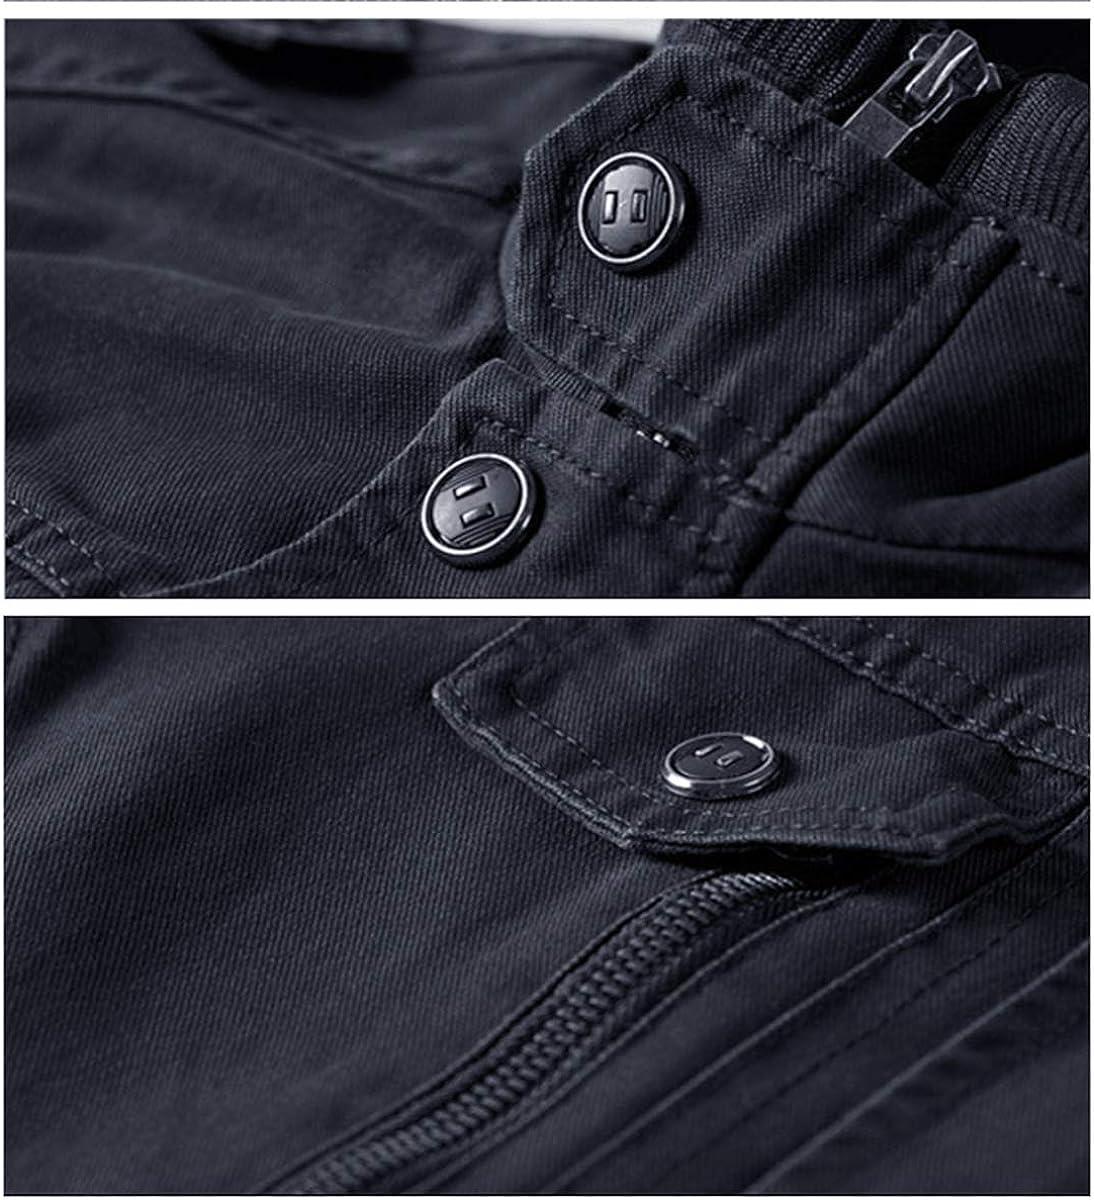 EKLENTSON Mens Fleece Lined Jackets Casual Winter Cargo Military Cotton Coat Thicken Outdoor Hiking Mountain Windbreaker Jacket with Multi Pocket